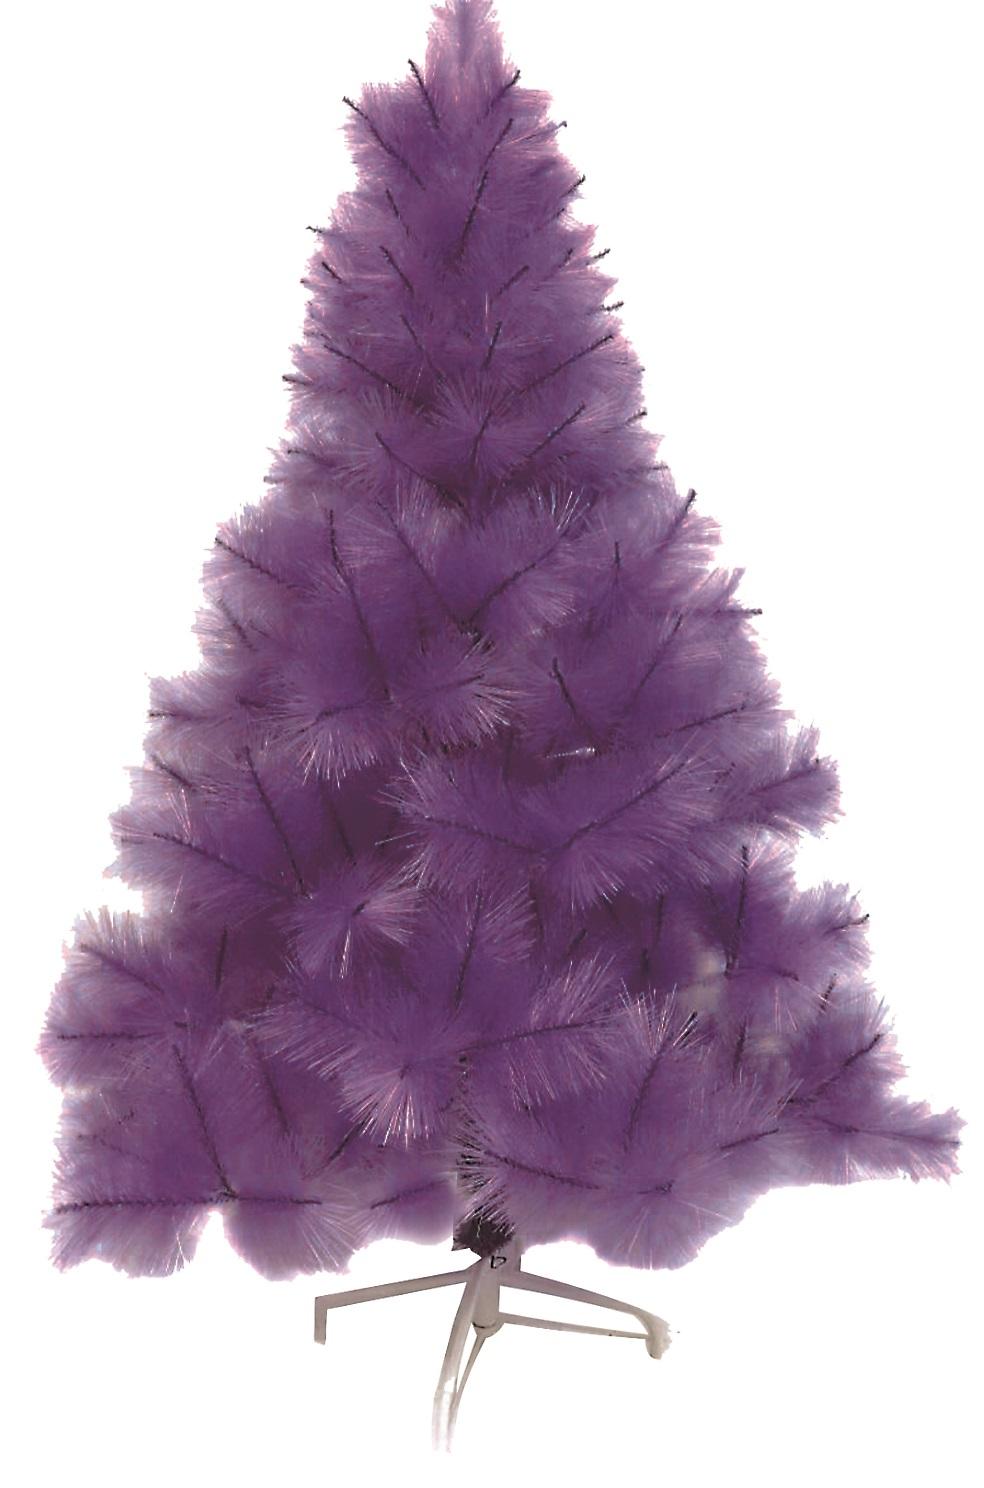 X射線【X020580】2尺聖誕松針樹(紫)(不含飾品、燈飾),聖誕樹/聖誕佈置/聖誕空樹/聖誕造景